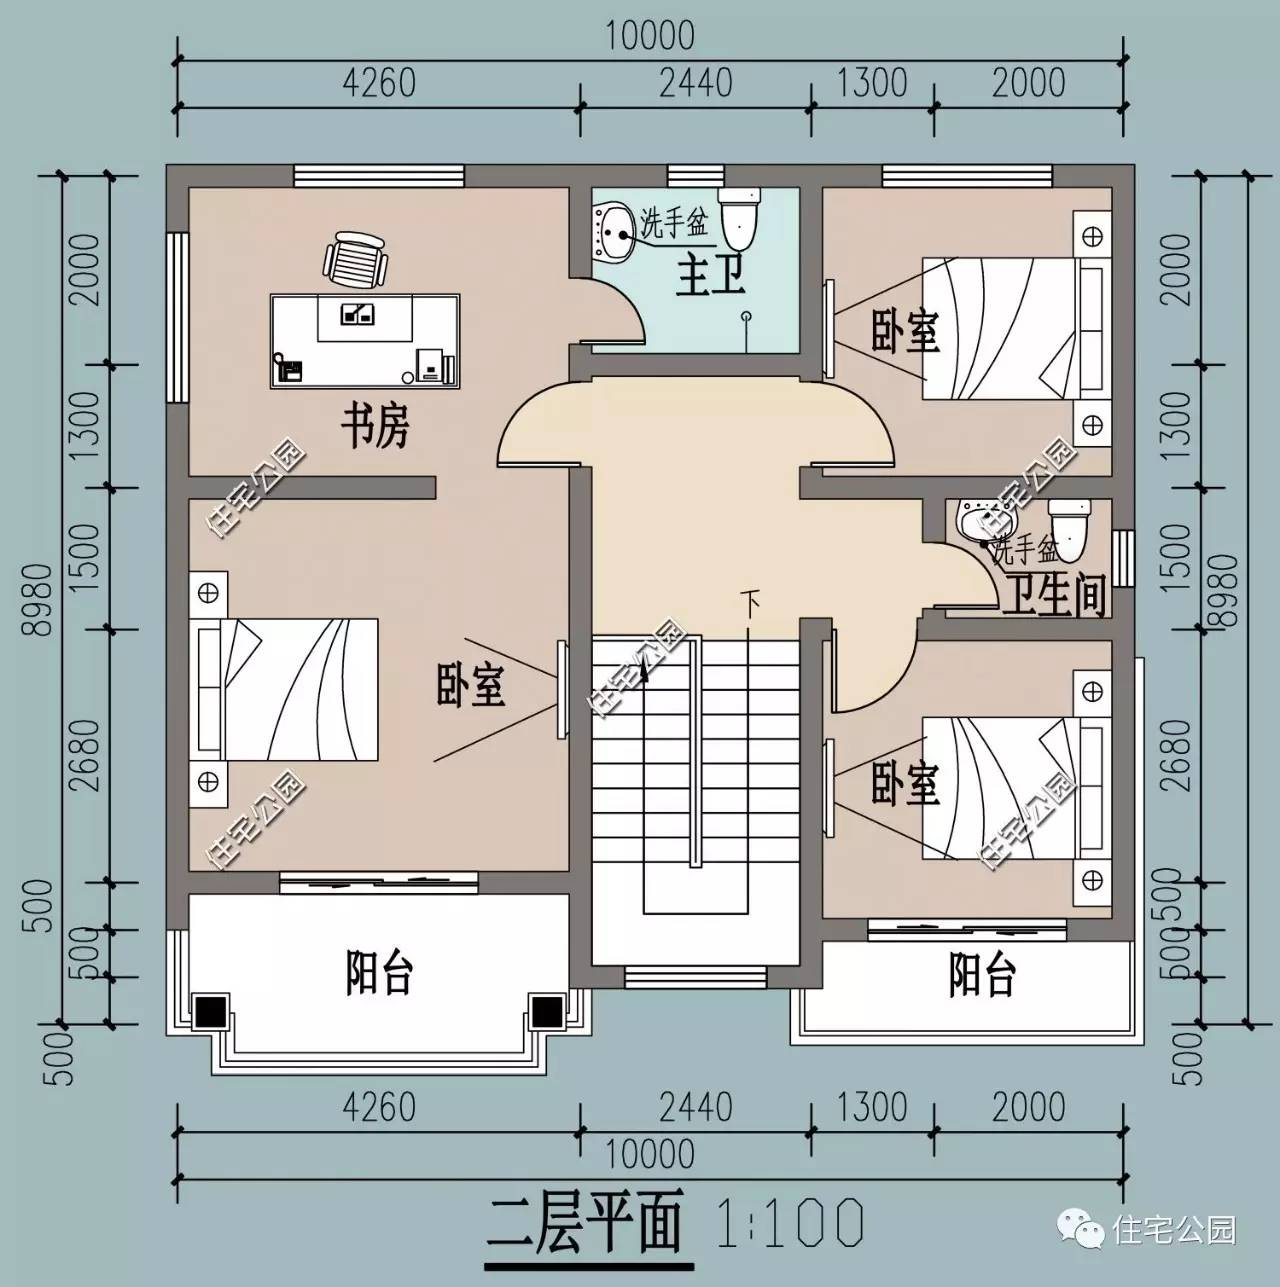 9x10米经济房平面图